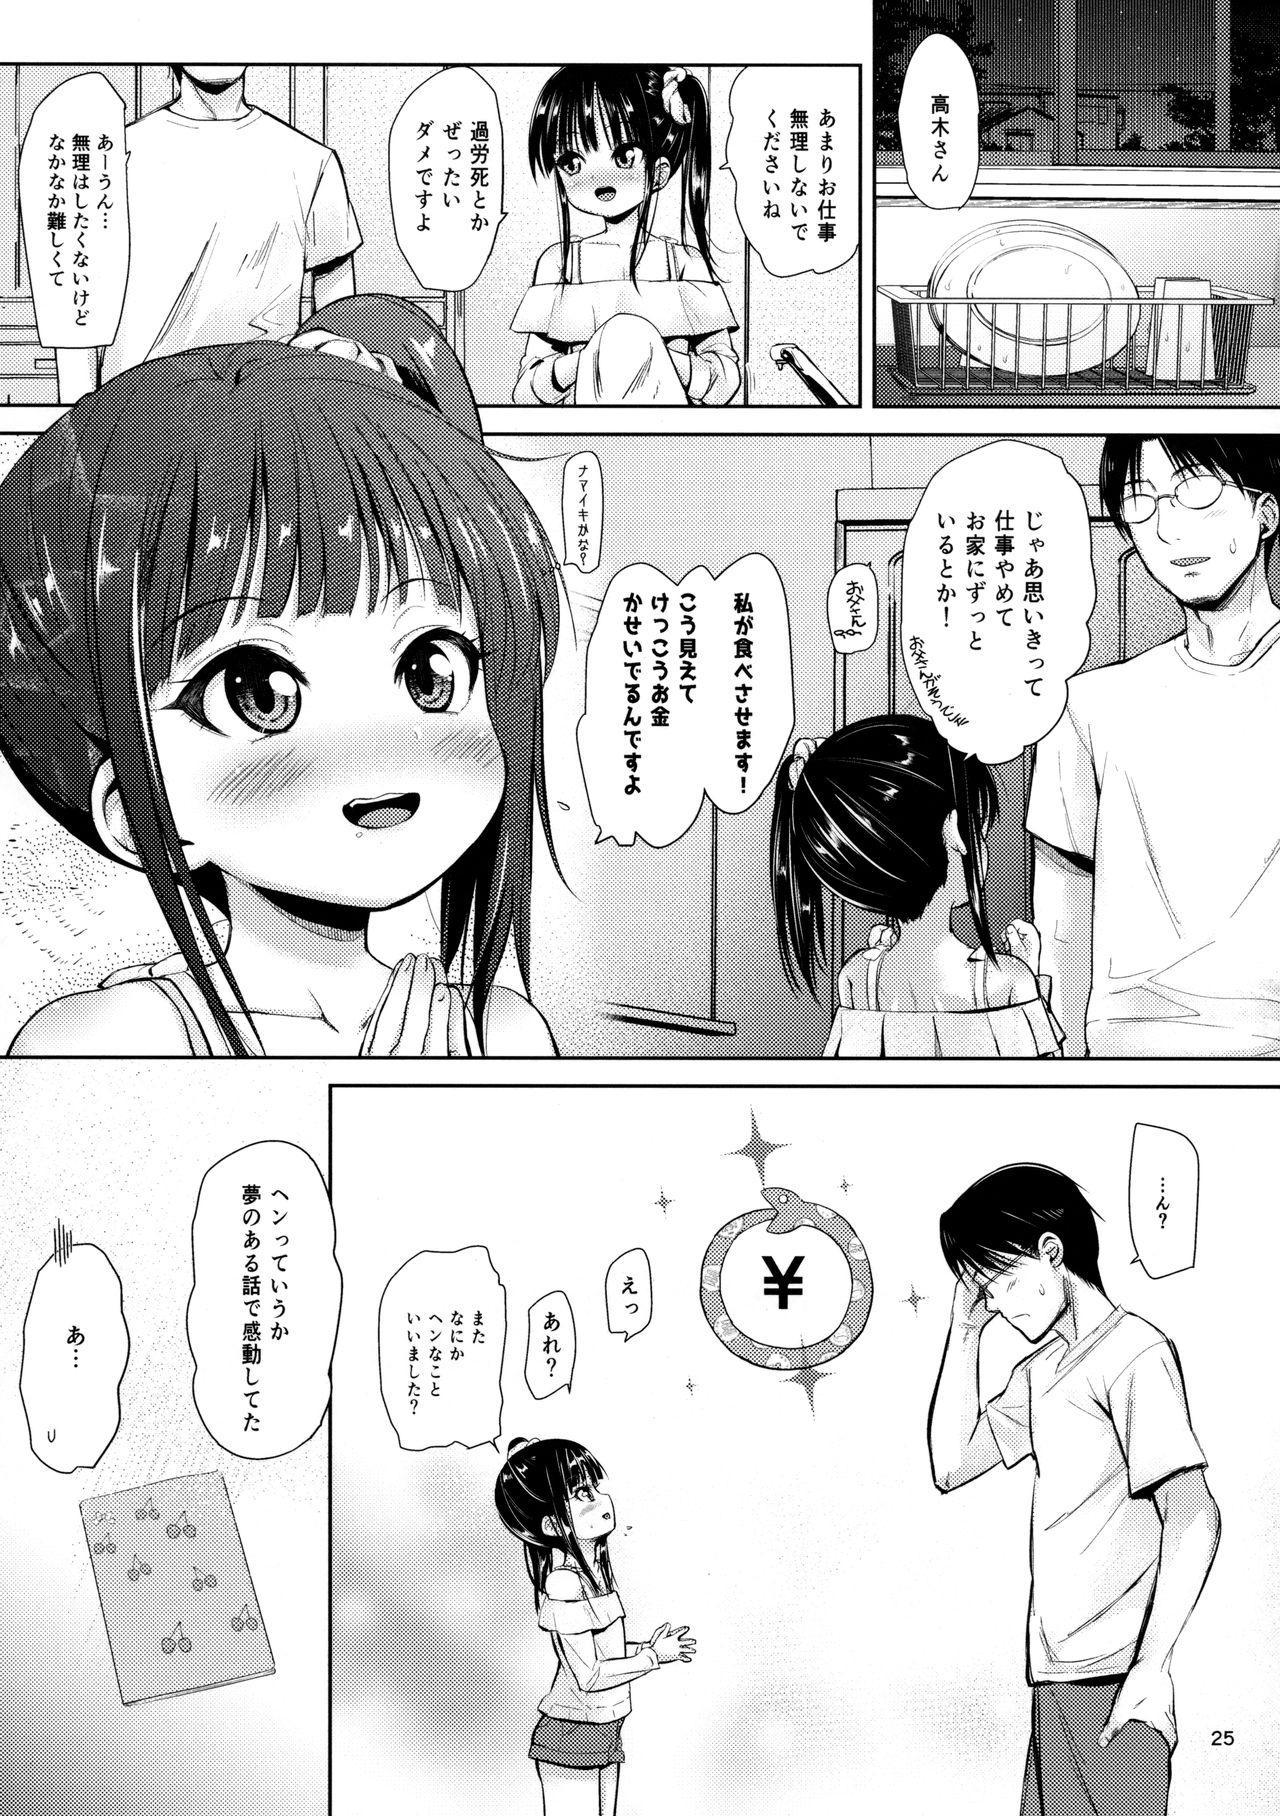 (C95) [Bizensiki Roroppu (Bizen)] JS Kaji Daikou (Gouhou) de Ecchigurashi 2 23